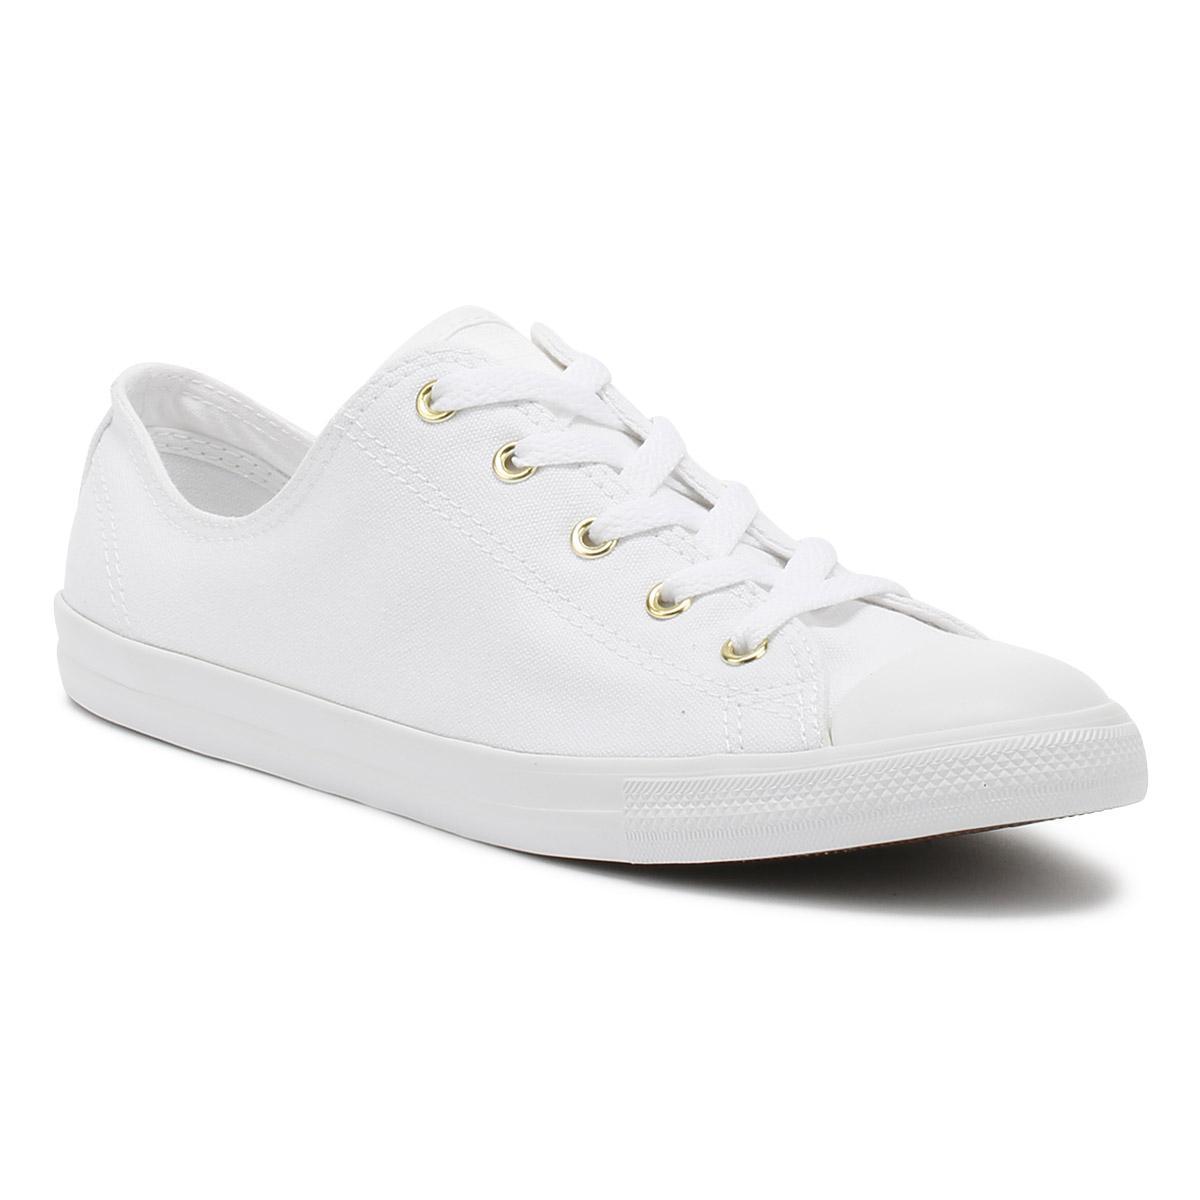 bf222a537e35 Converse Chuck Taylor All Star Womens White   Gold Dainty Ox ...